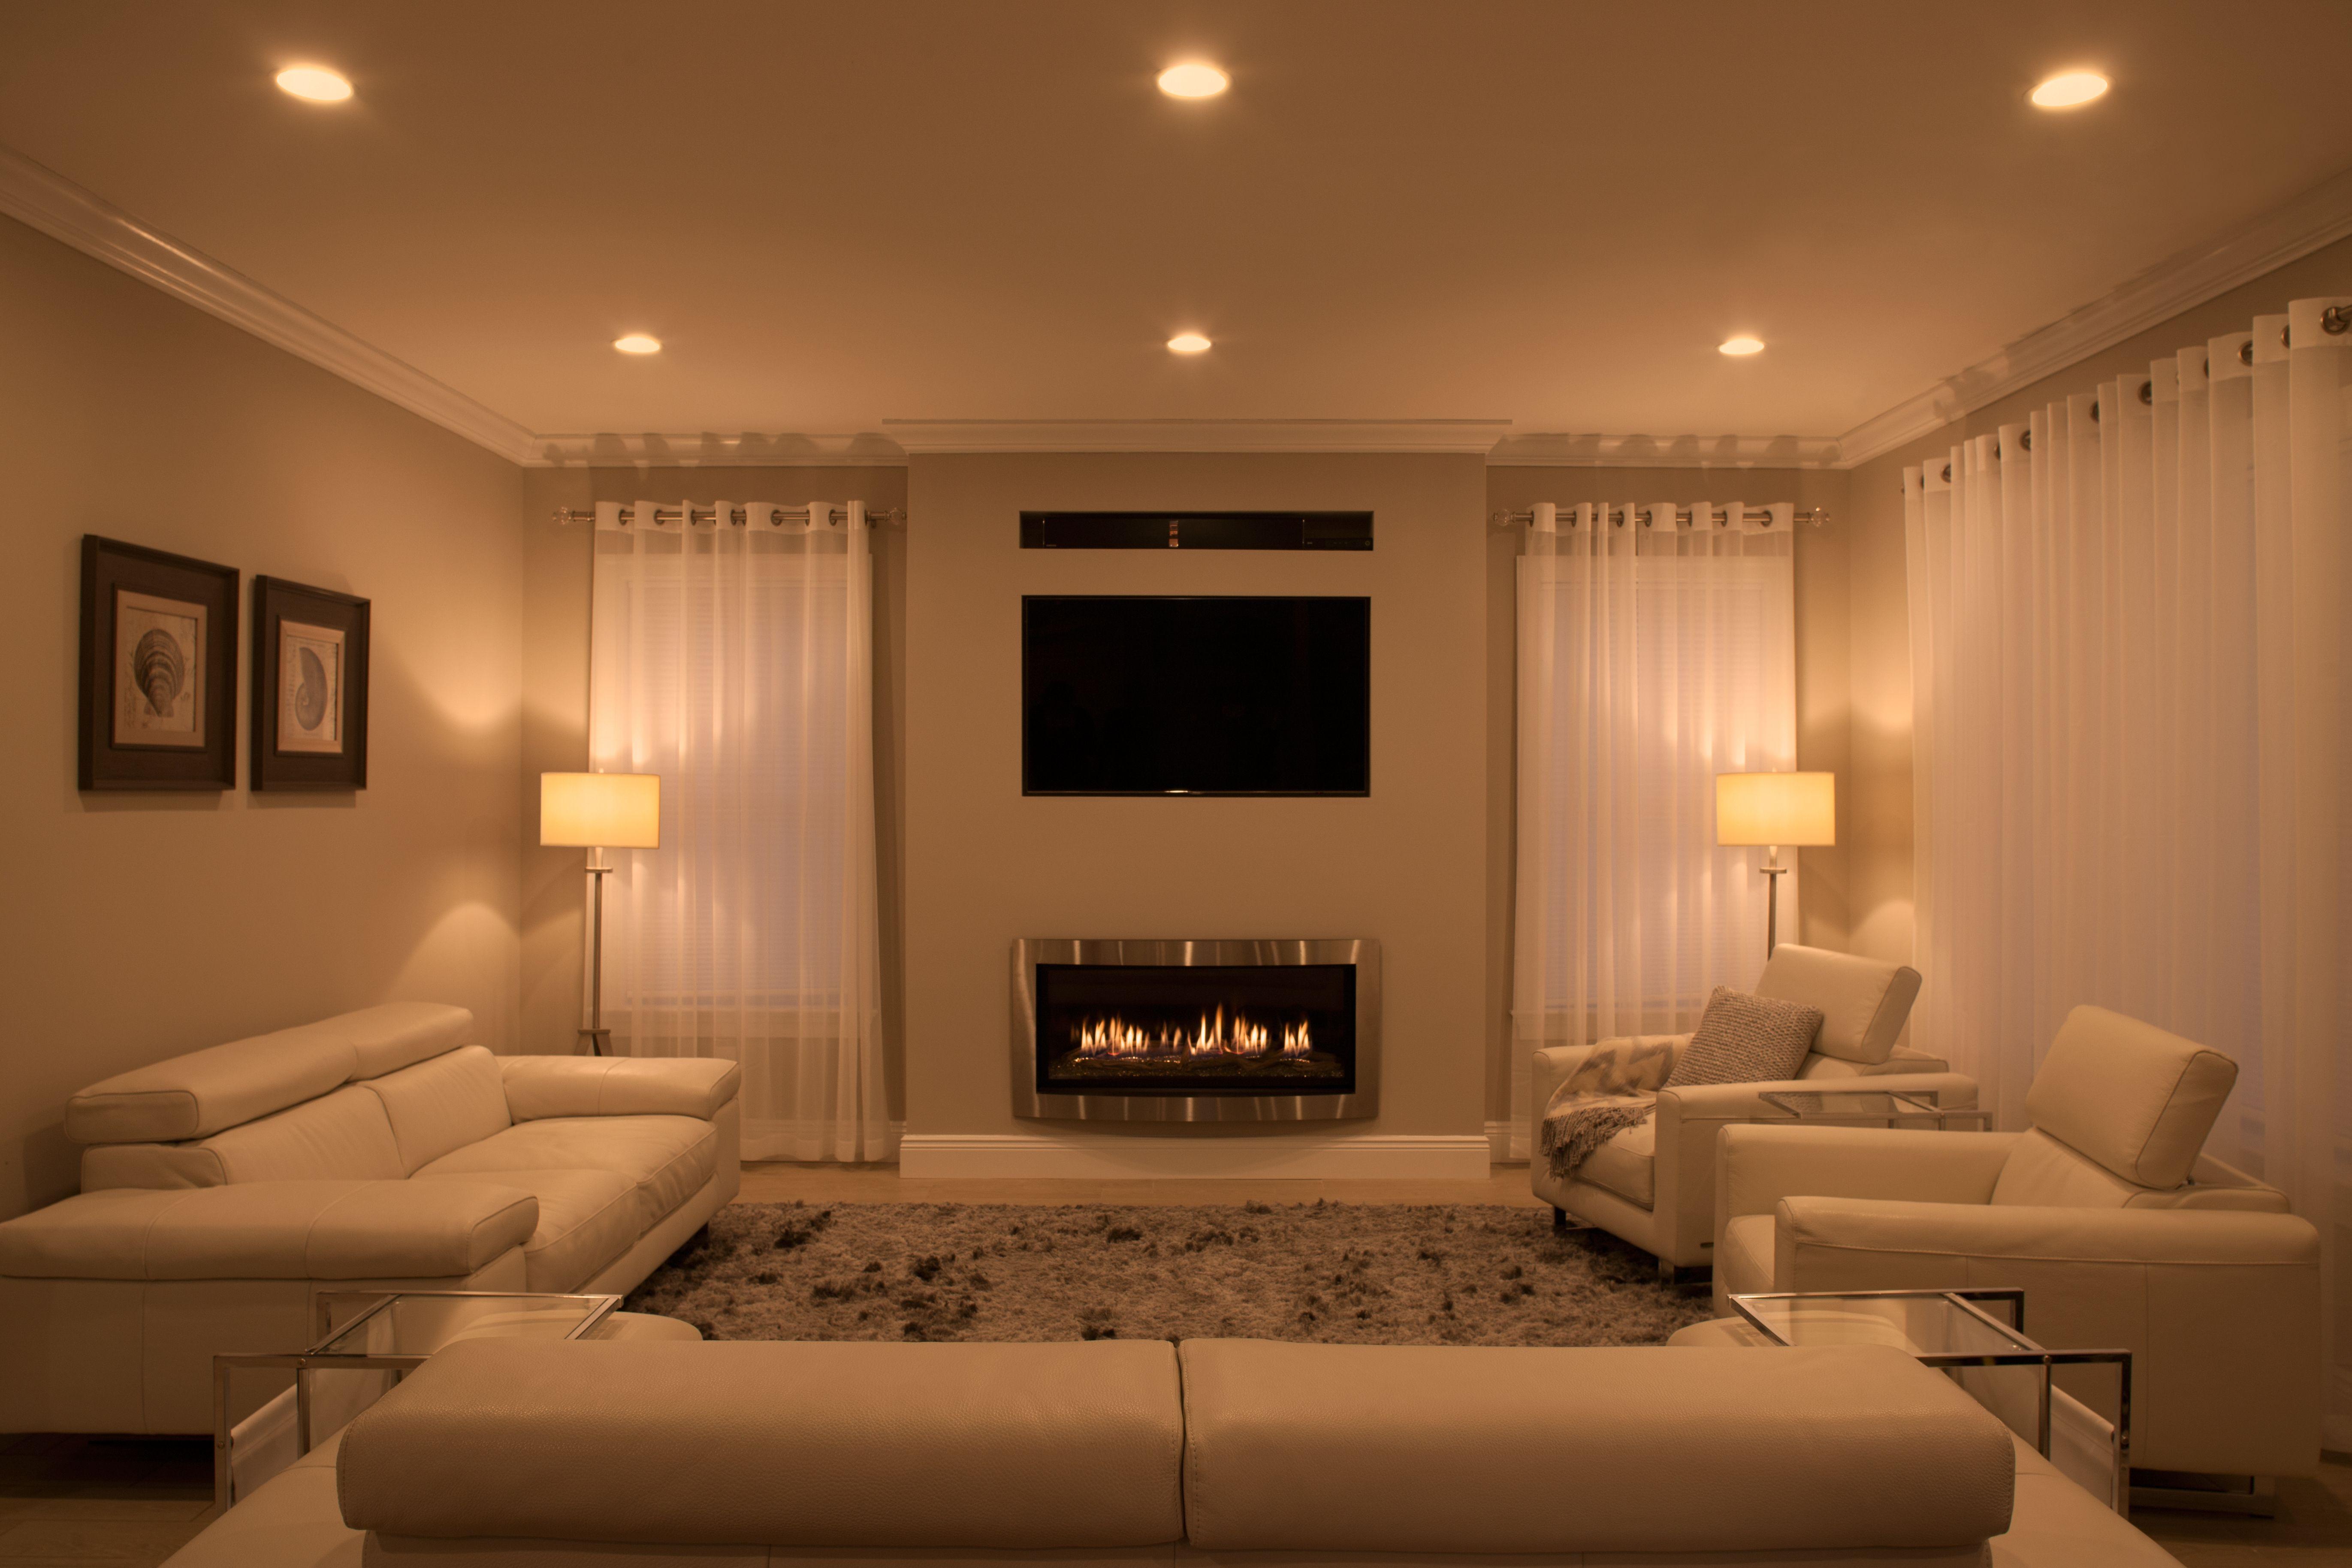 Warm Glow Dimming Null Dimmable Light Bulbs Smart Light Bulbs